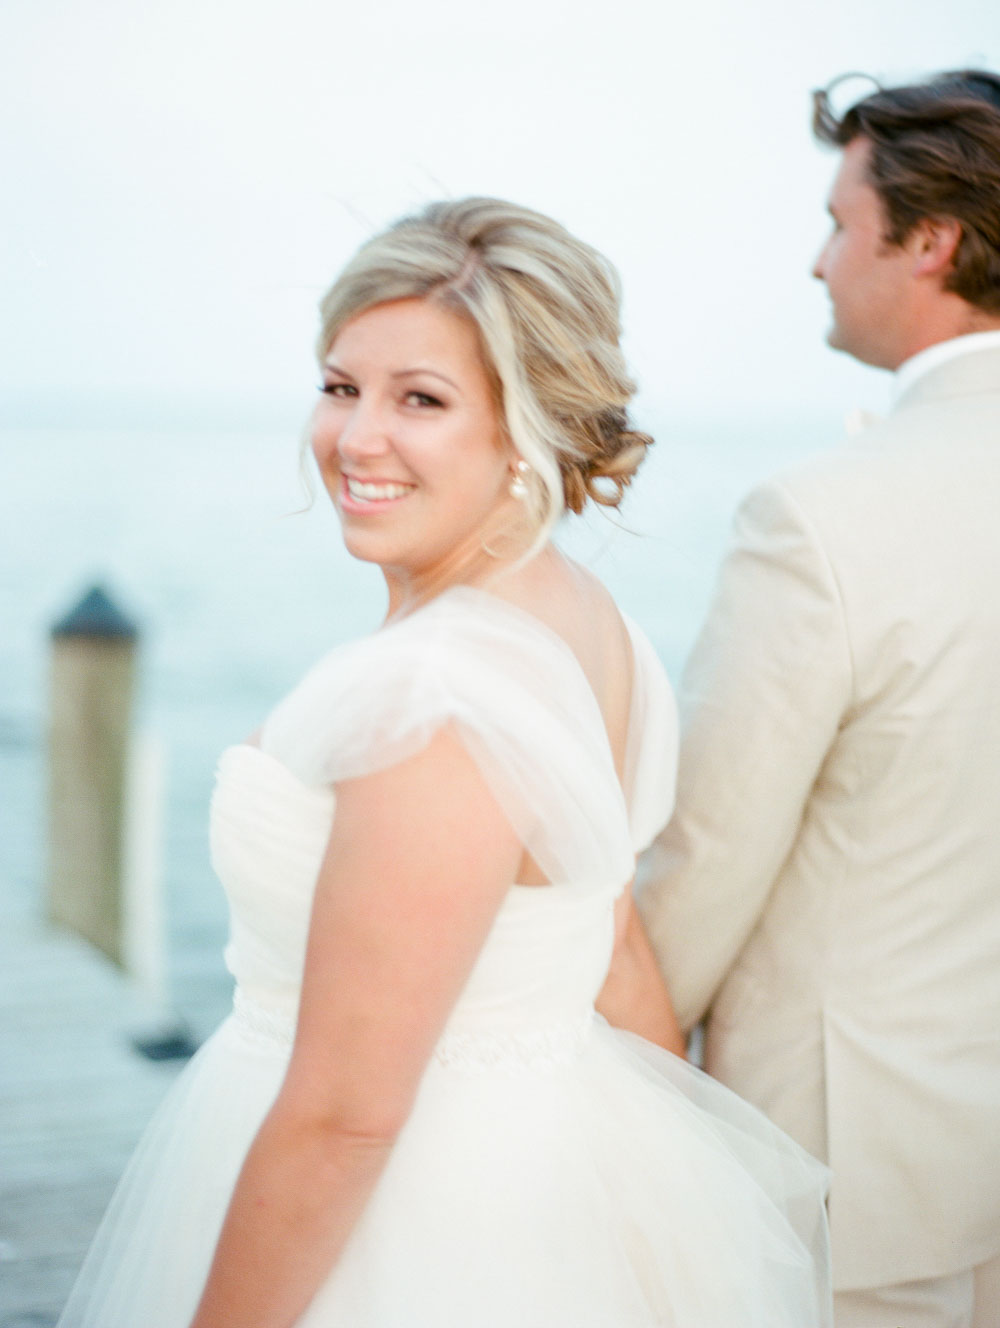 kateweinsteinphoto_racheldave_rehobeth_beach_wedding-159.jpg